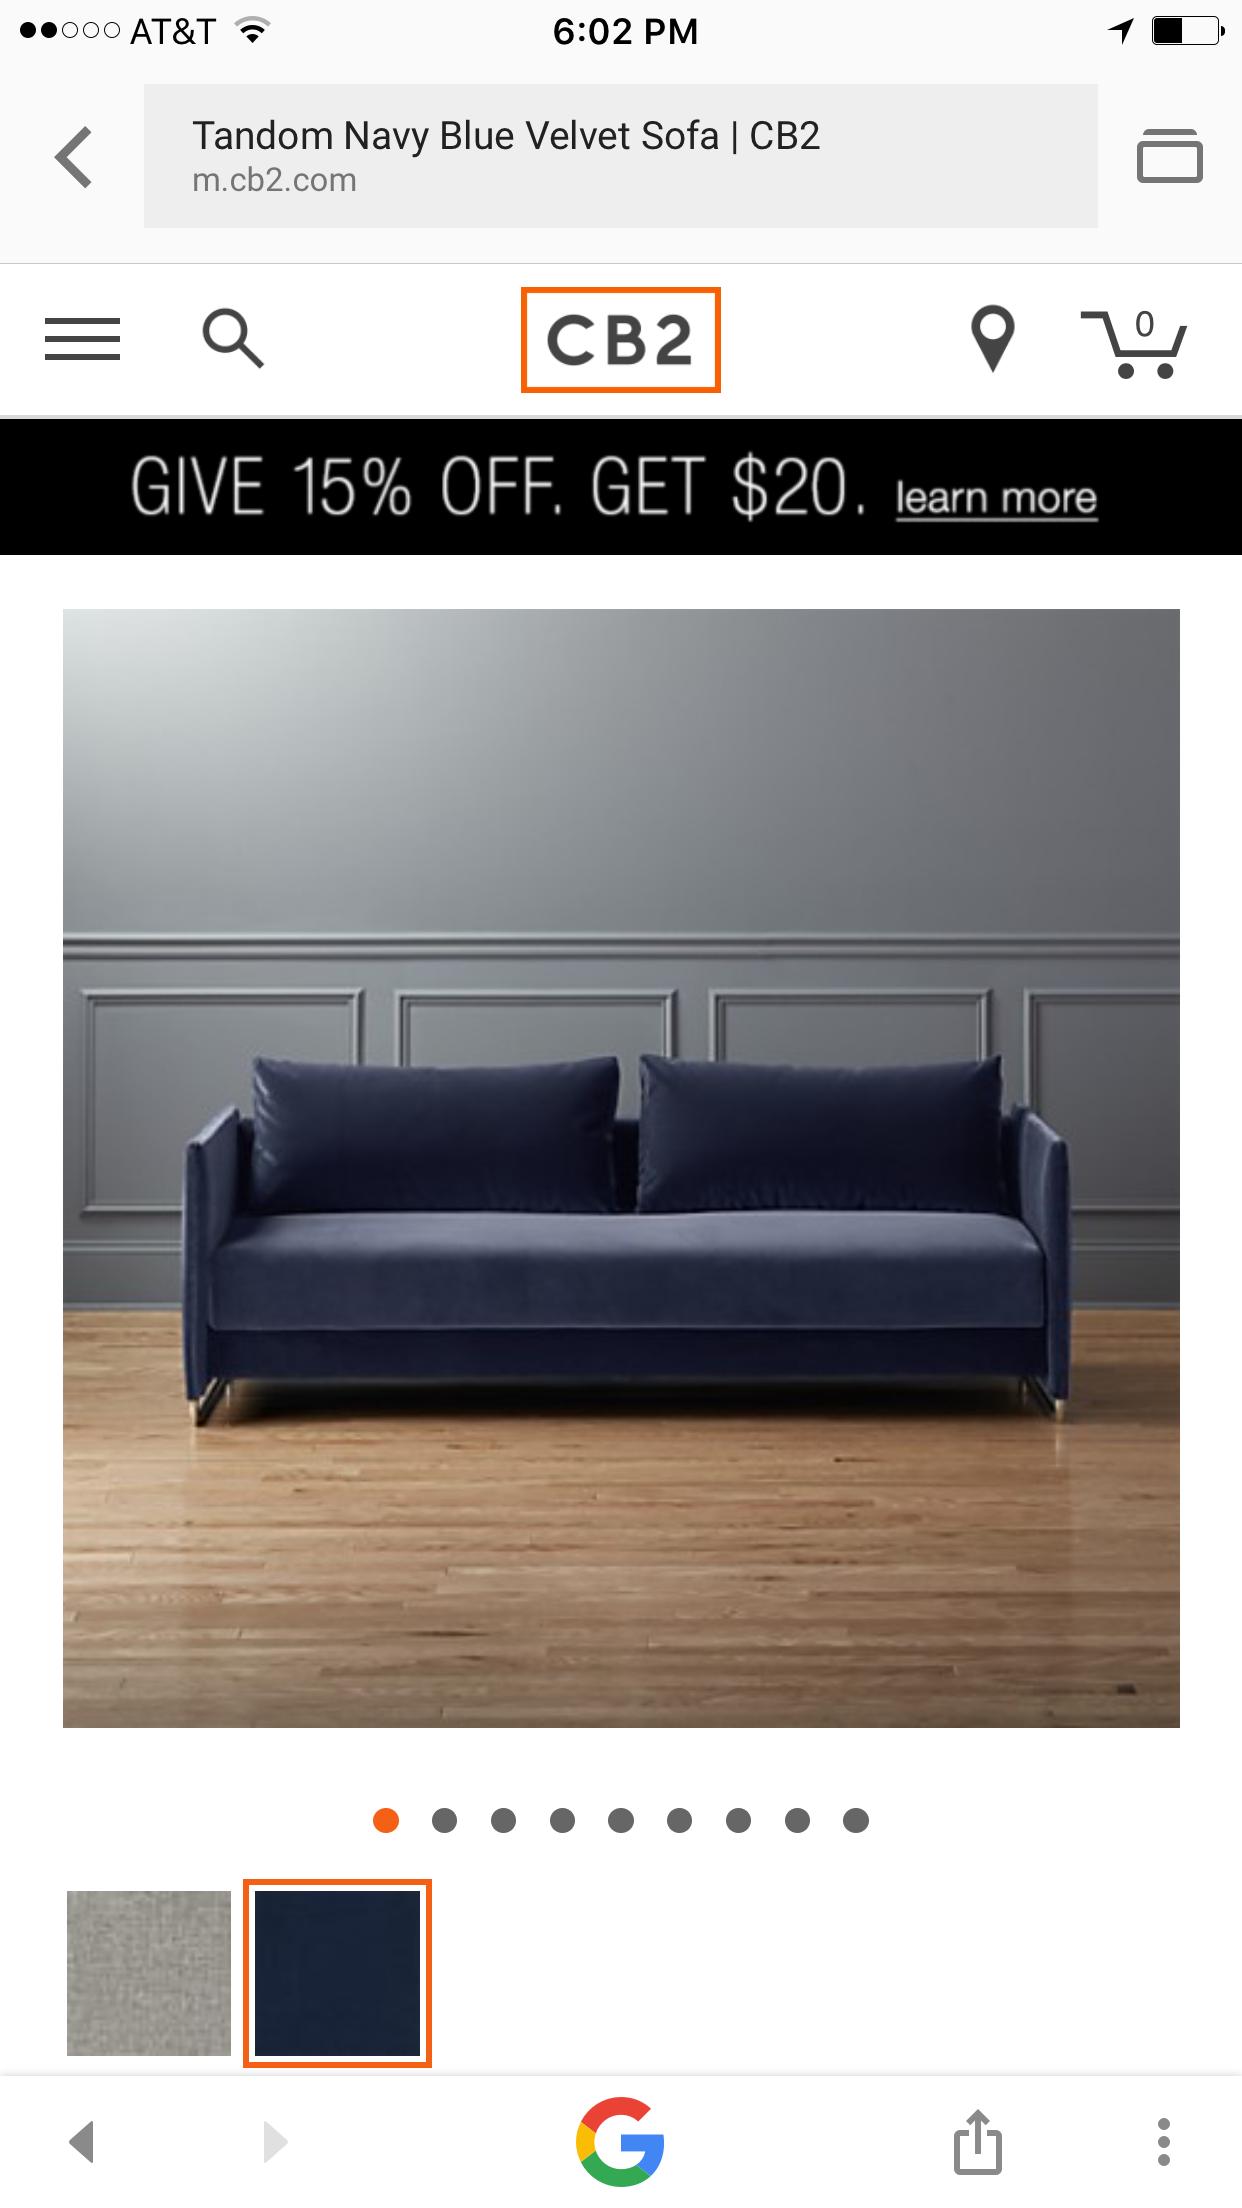 Cb2 Tandom Sleeper Sofa Spent Days Researching Sofas That Flip